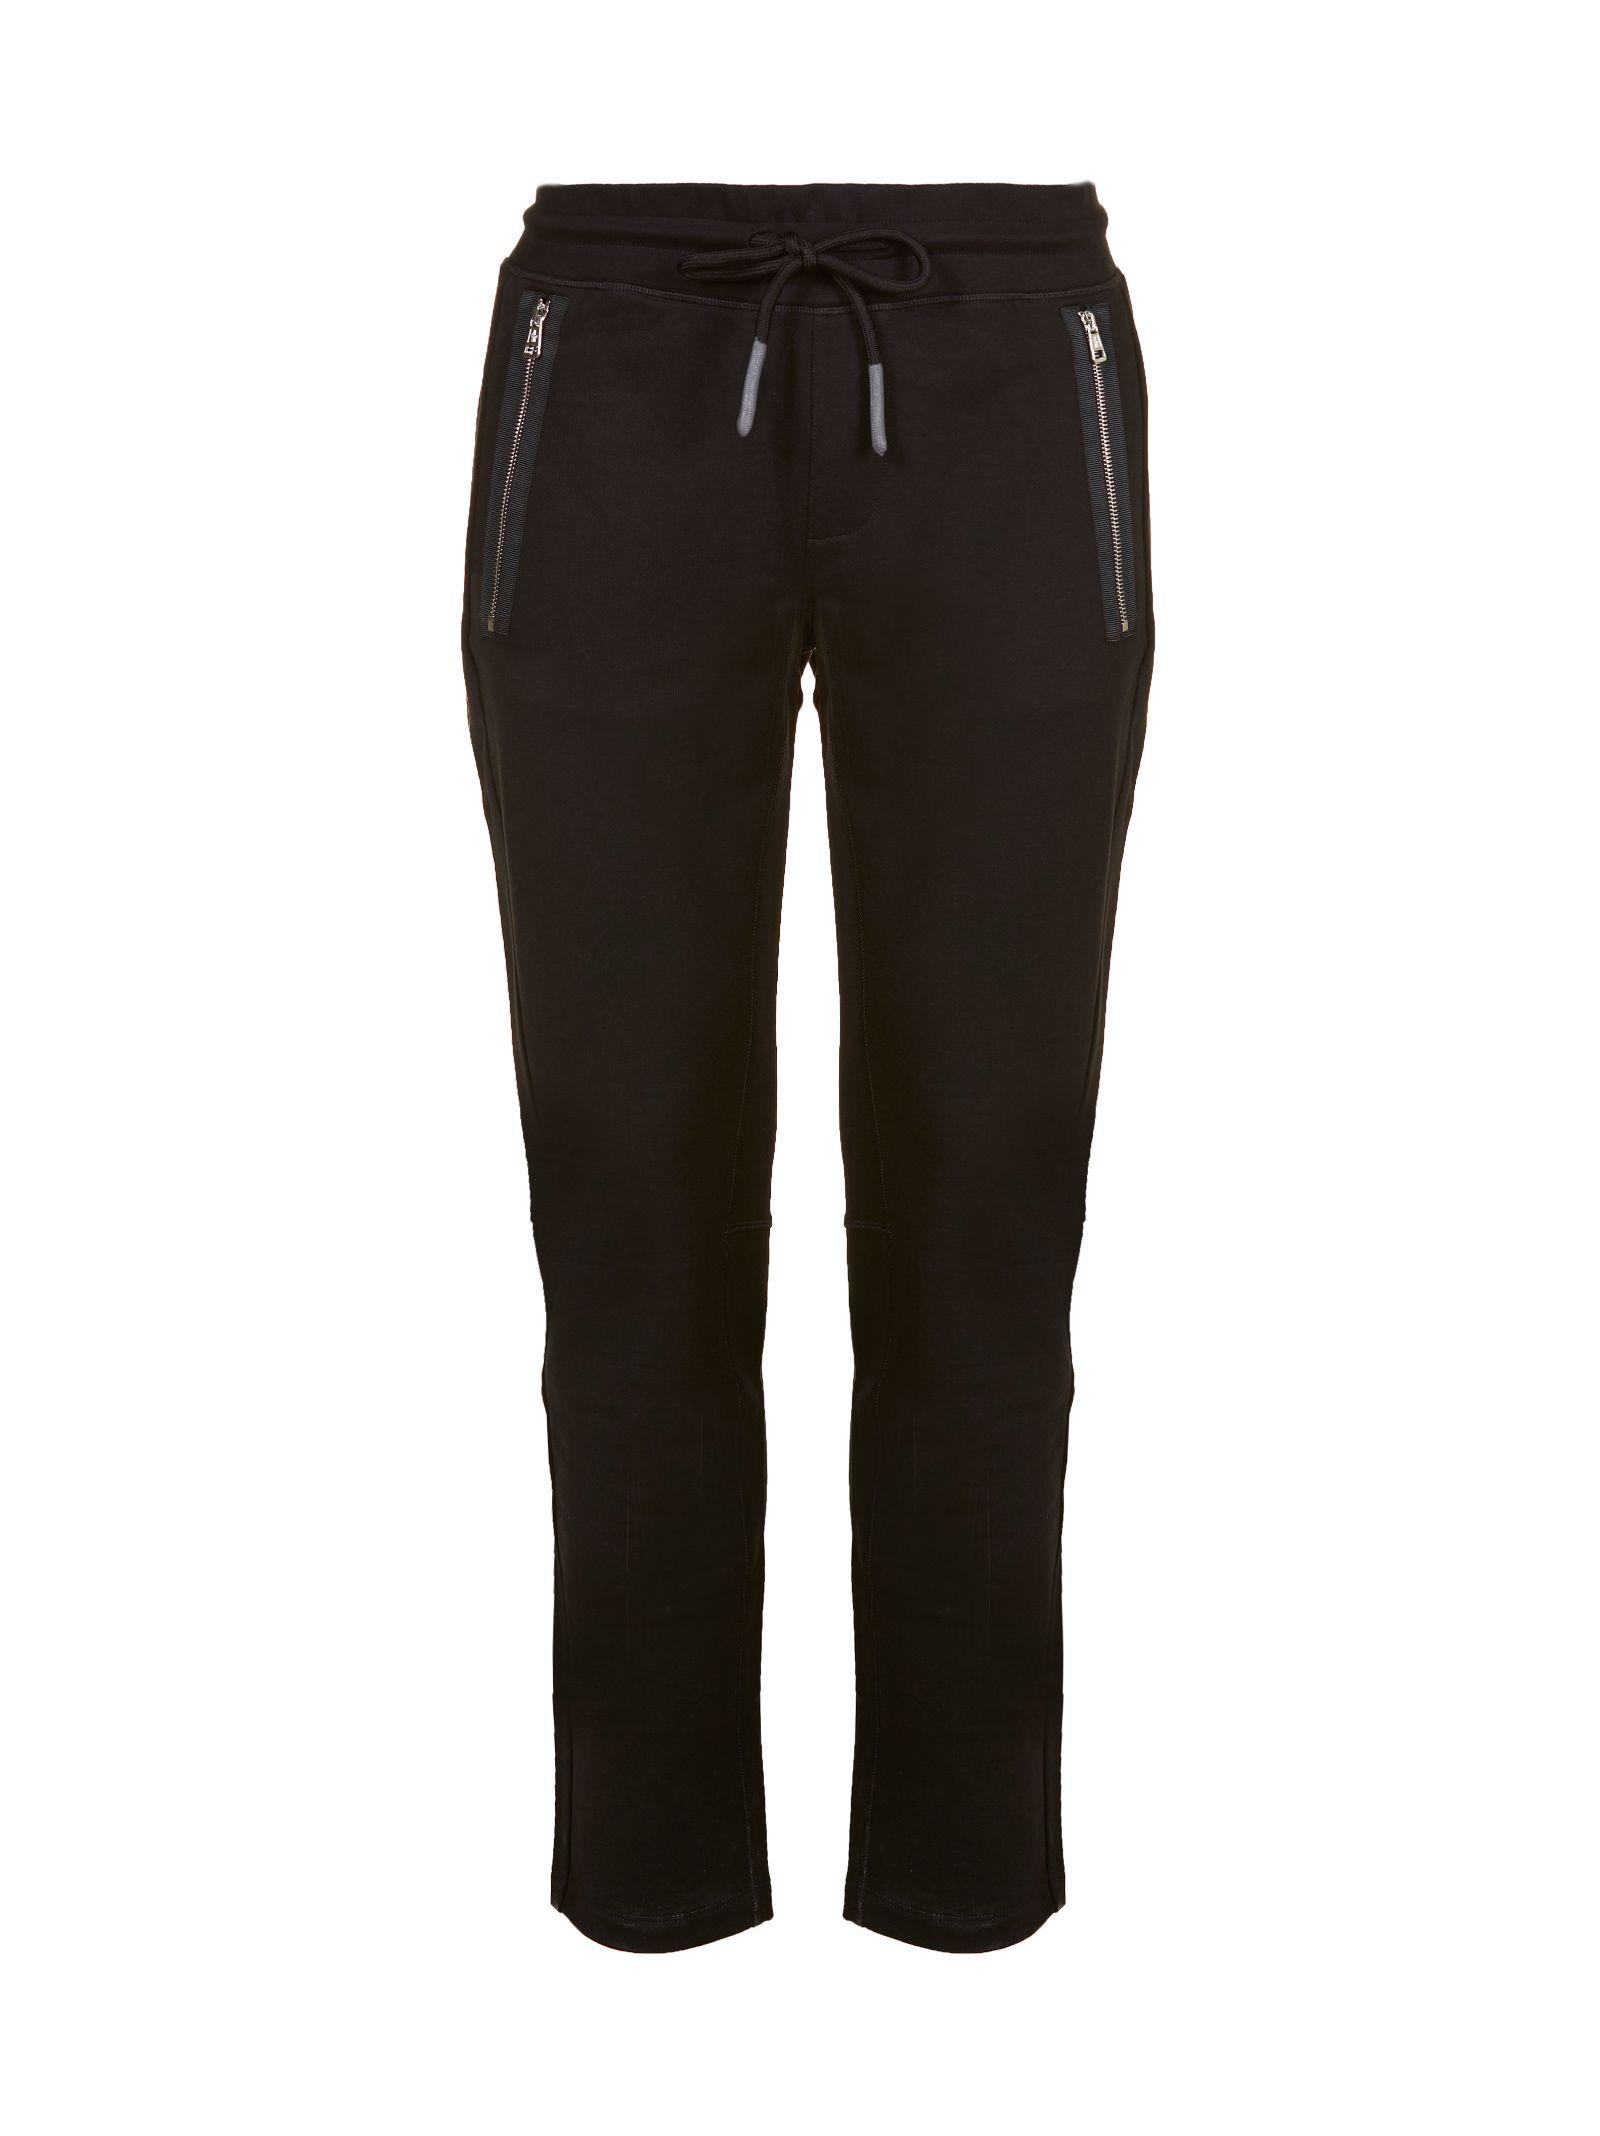 Moncler Zipped Pocket Sweatpants